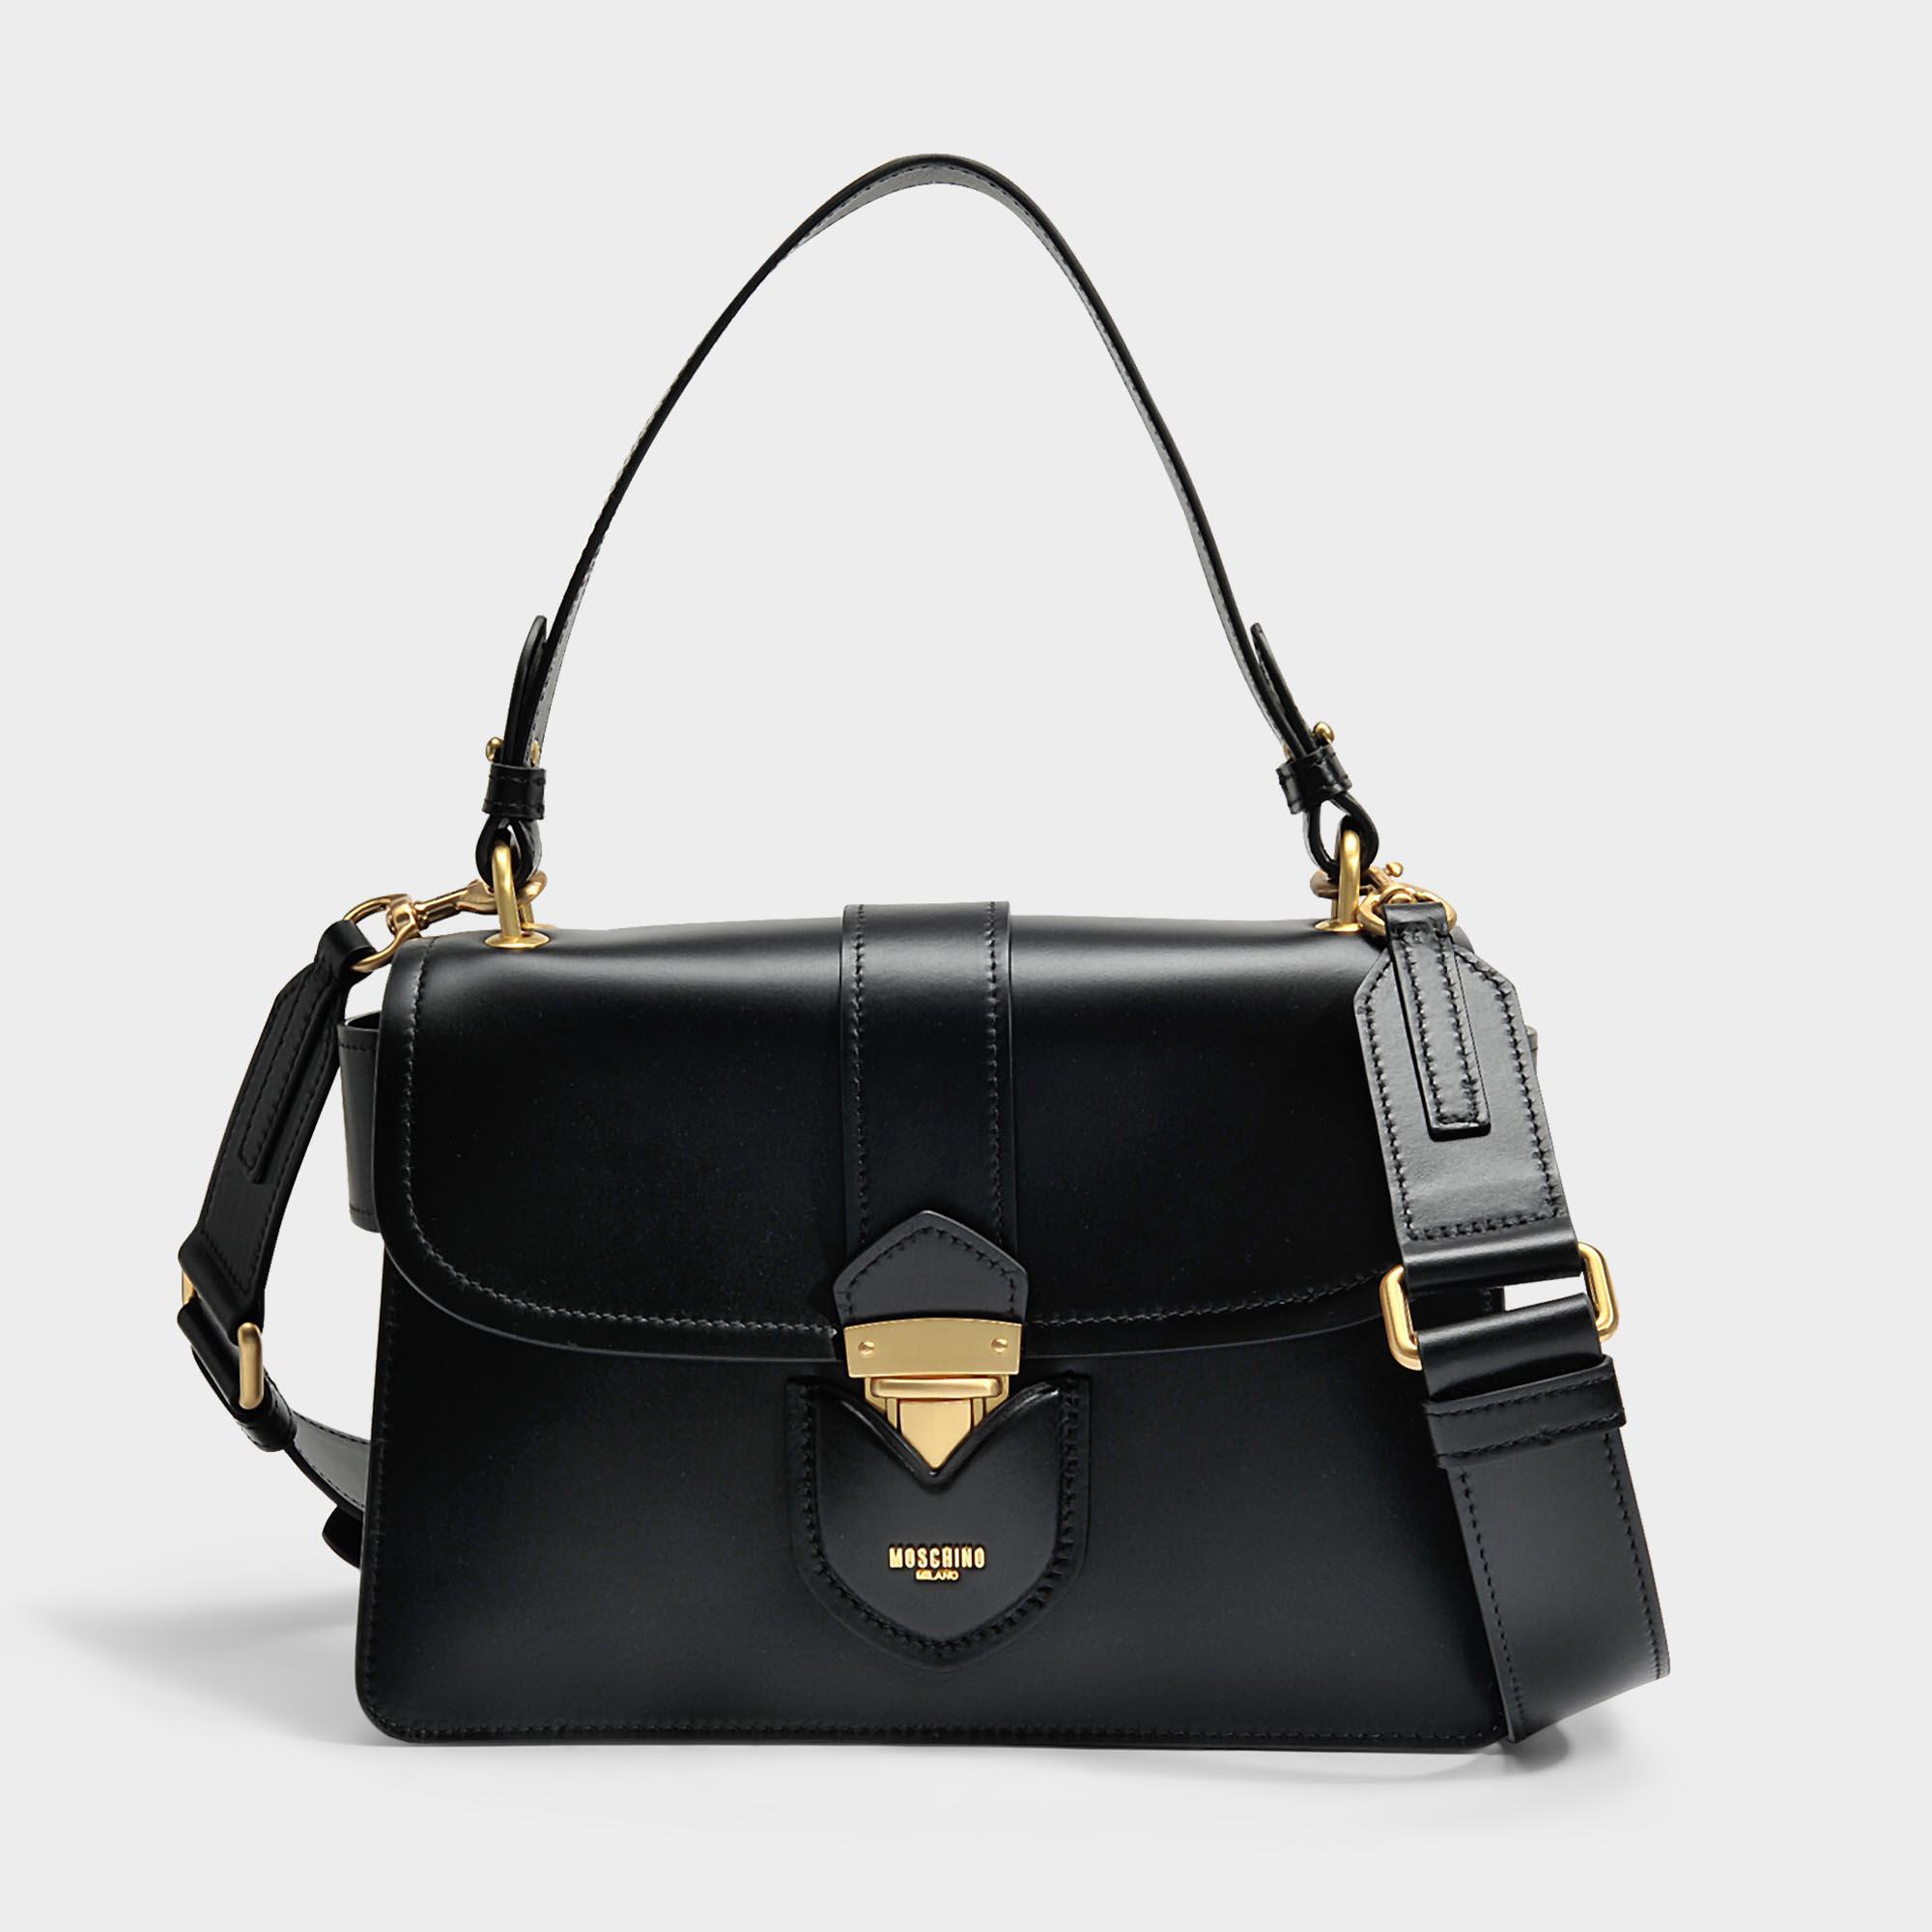 Hidden Lock Shoulder Bag in Black Calfskin Moschino oU0KT9R